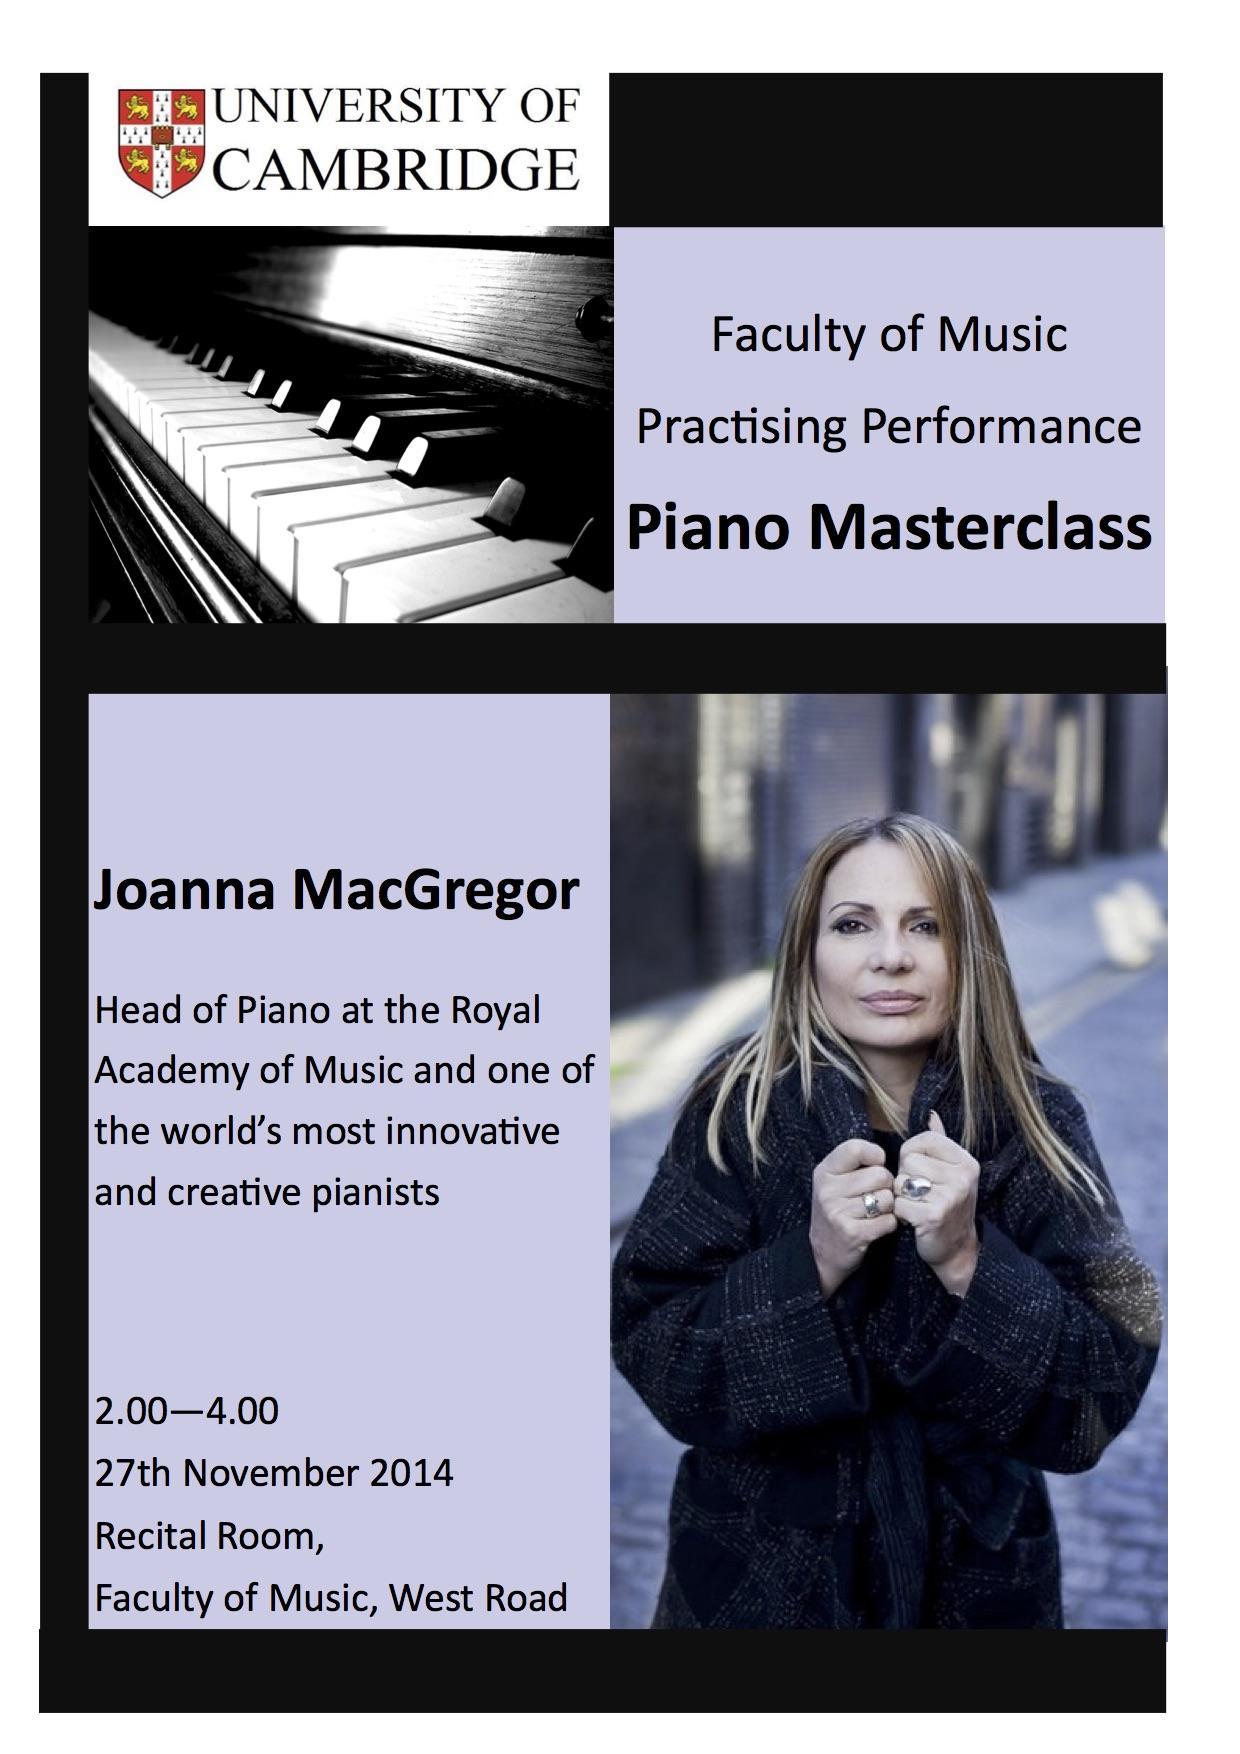 Joanna MacGregor Masterclass – 2.00pm, 27 November